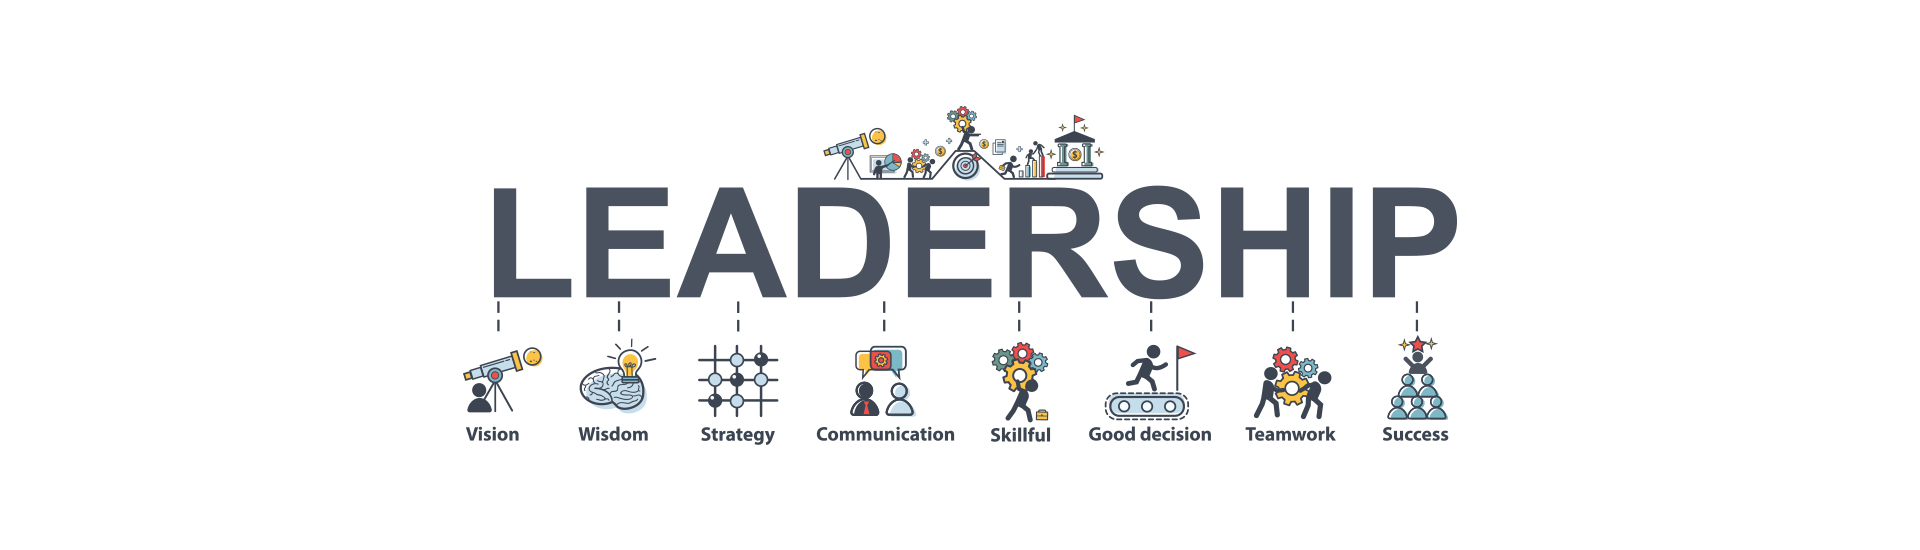 leadership management course